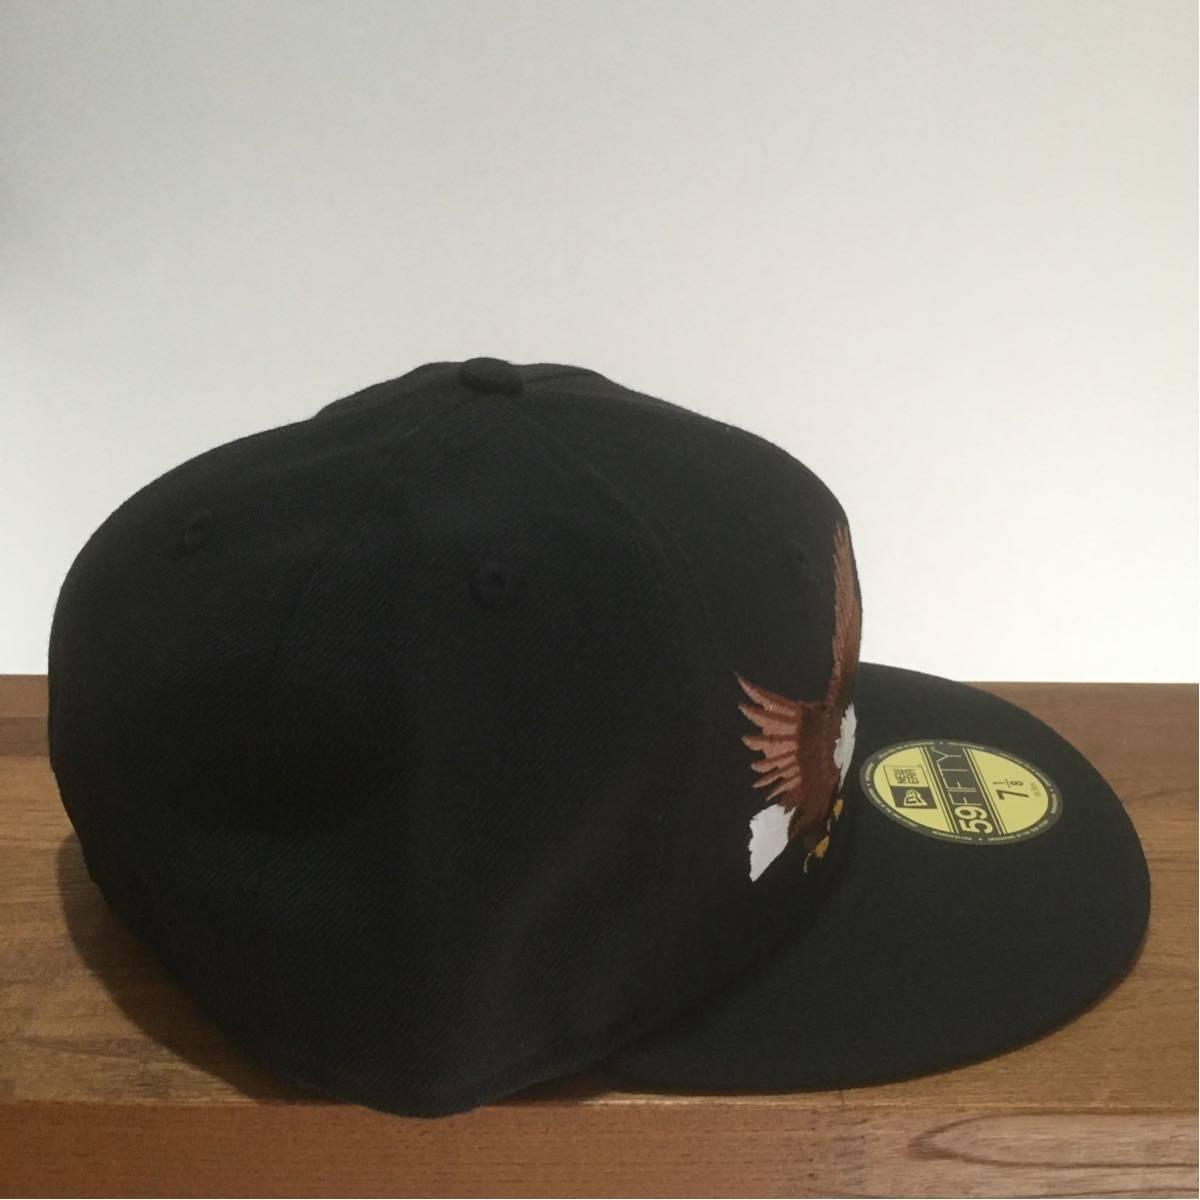 NEW ERA ニューエラ 59FIFTY スカジャンカスタム イーグル 鷲 刺繍 キャップ 帽子 野球帽 7 1/8 56.8cm 新品未使用 正規品 希少 限定 レア_画像4